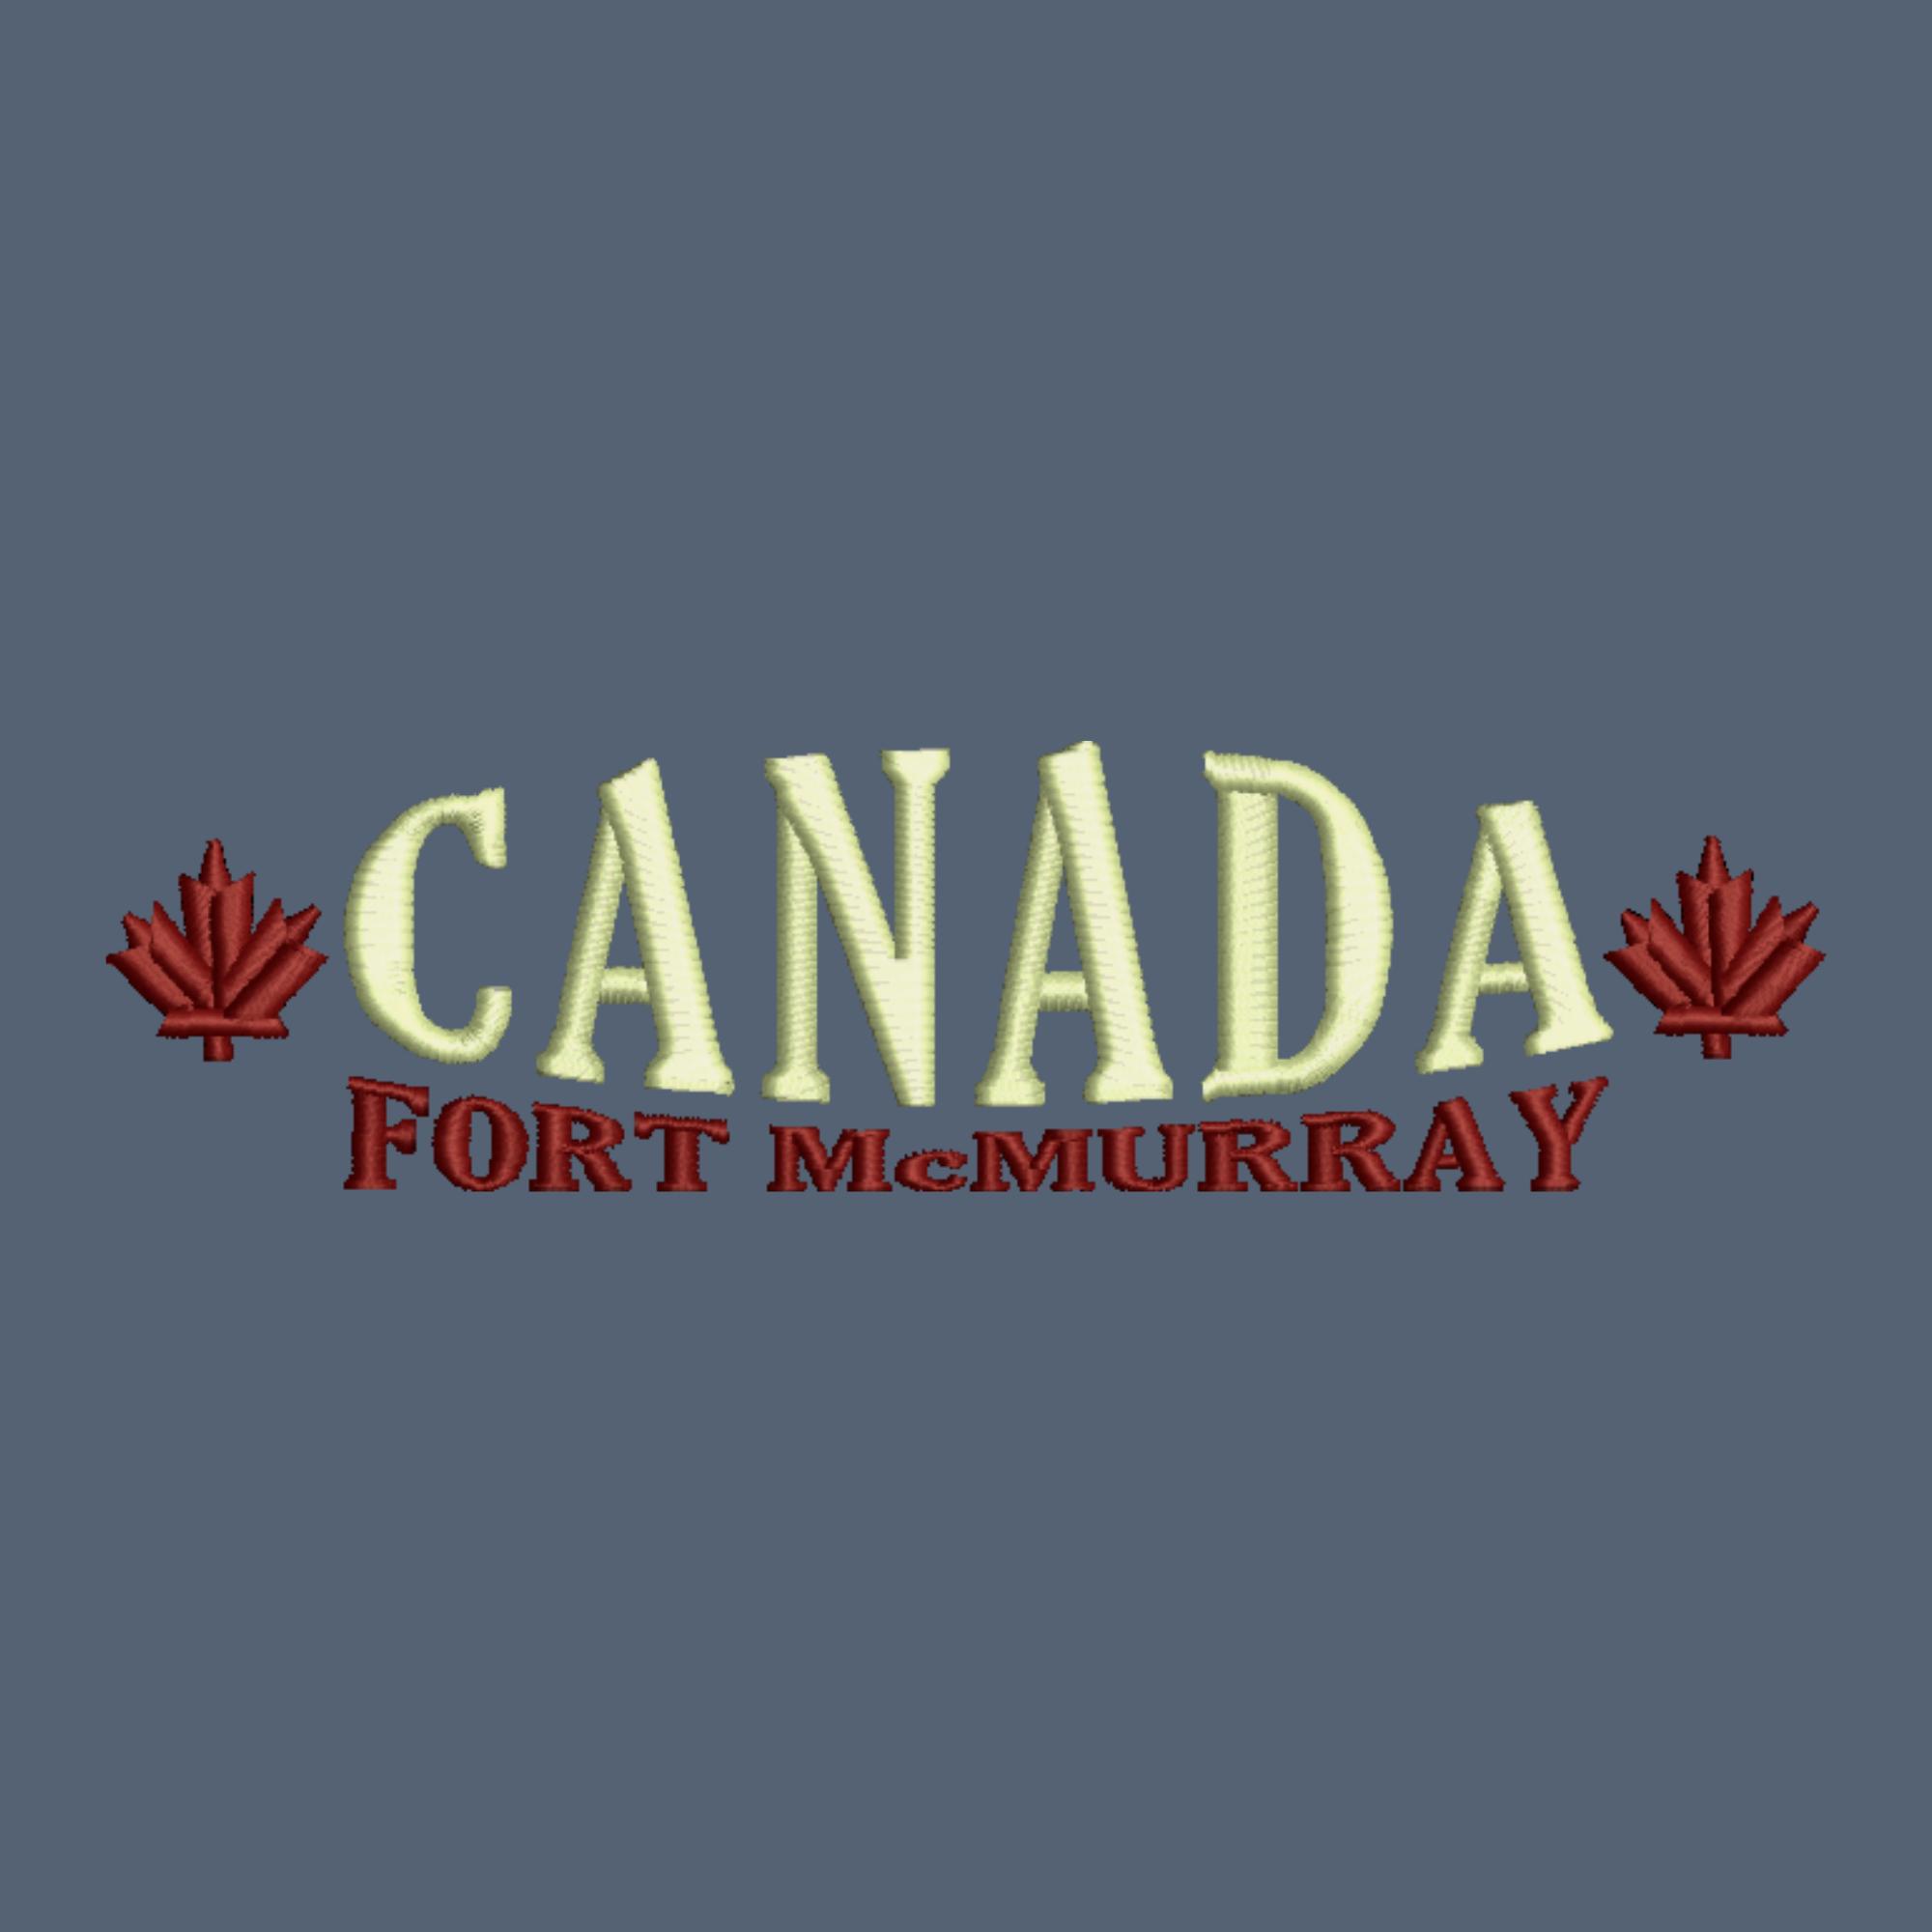 Canada with Leaf